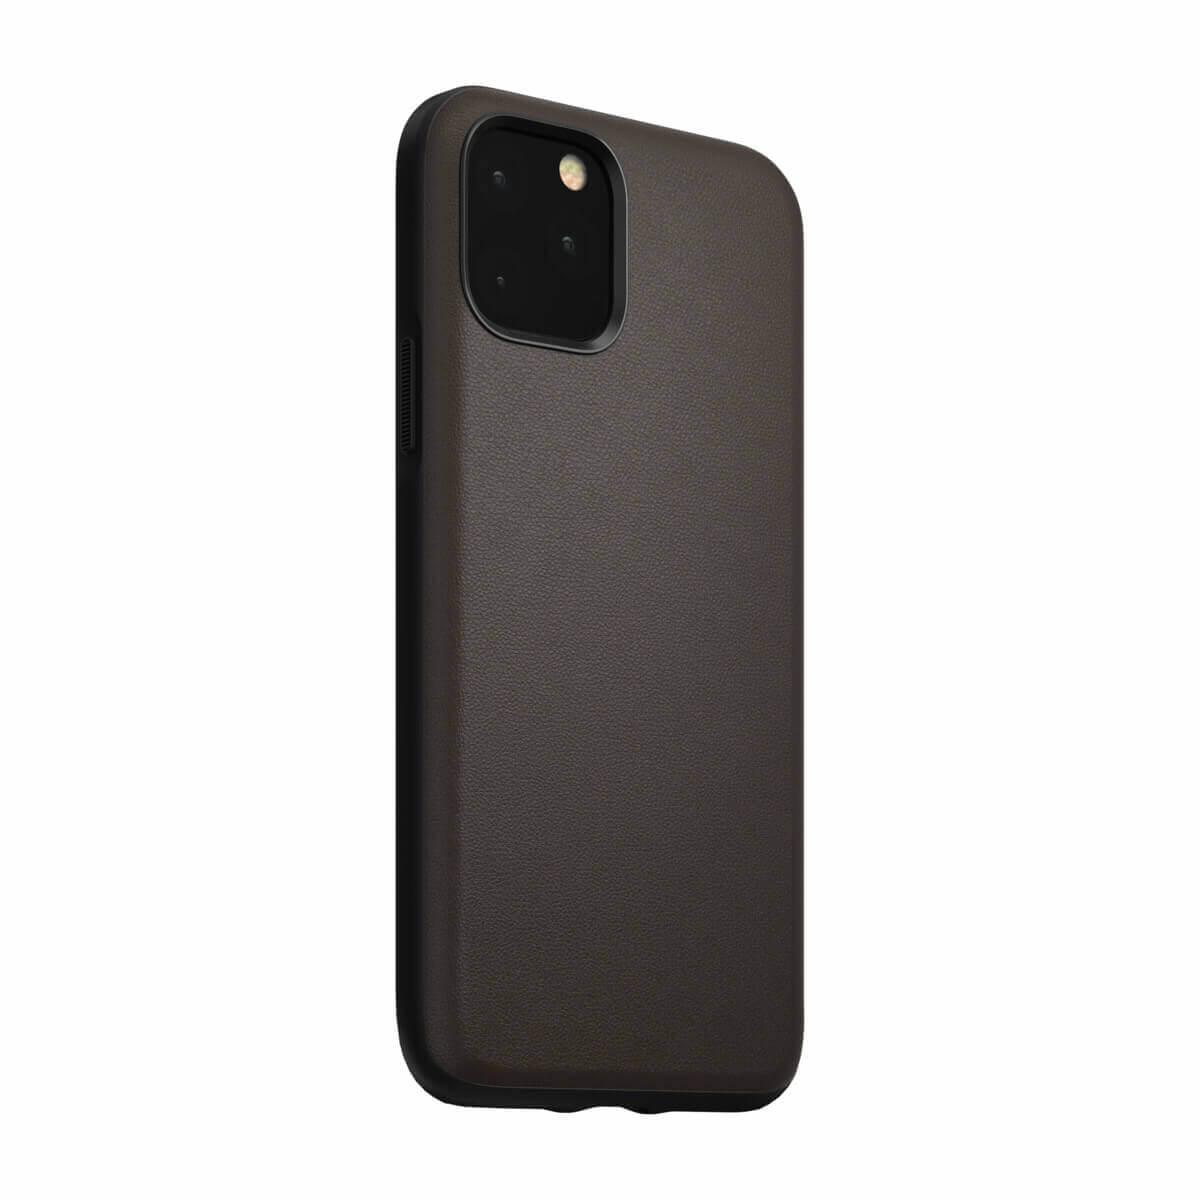 Nomad Leather Rugged Waterproof Case — кожен (естествена кожа) кейс за iPhone 11 Pro (кафяв) - 1